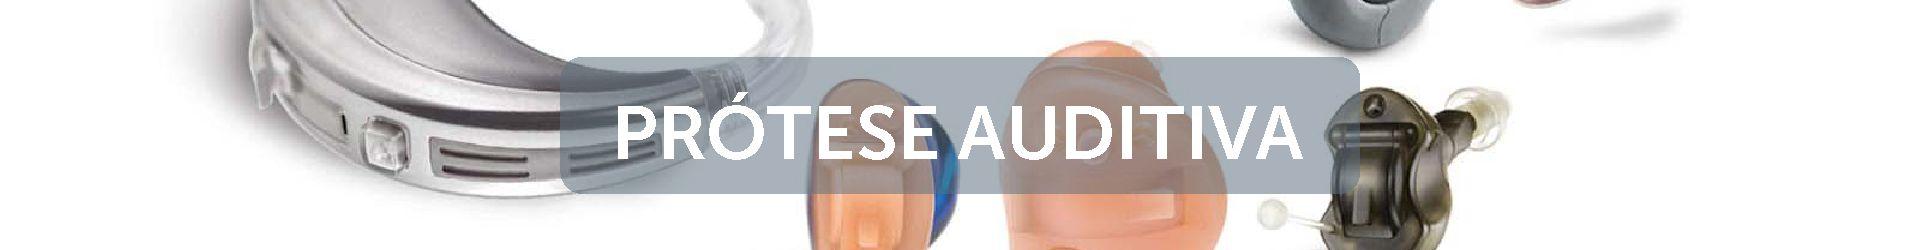 nucleo-persono-procedimentos-protese-auditiva